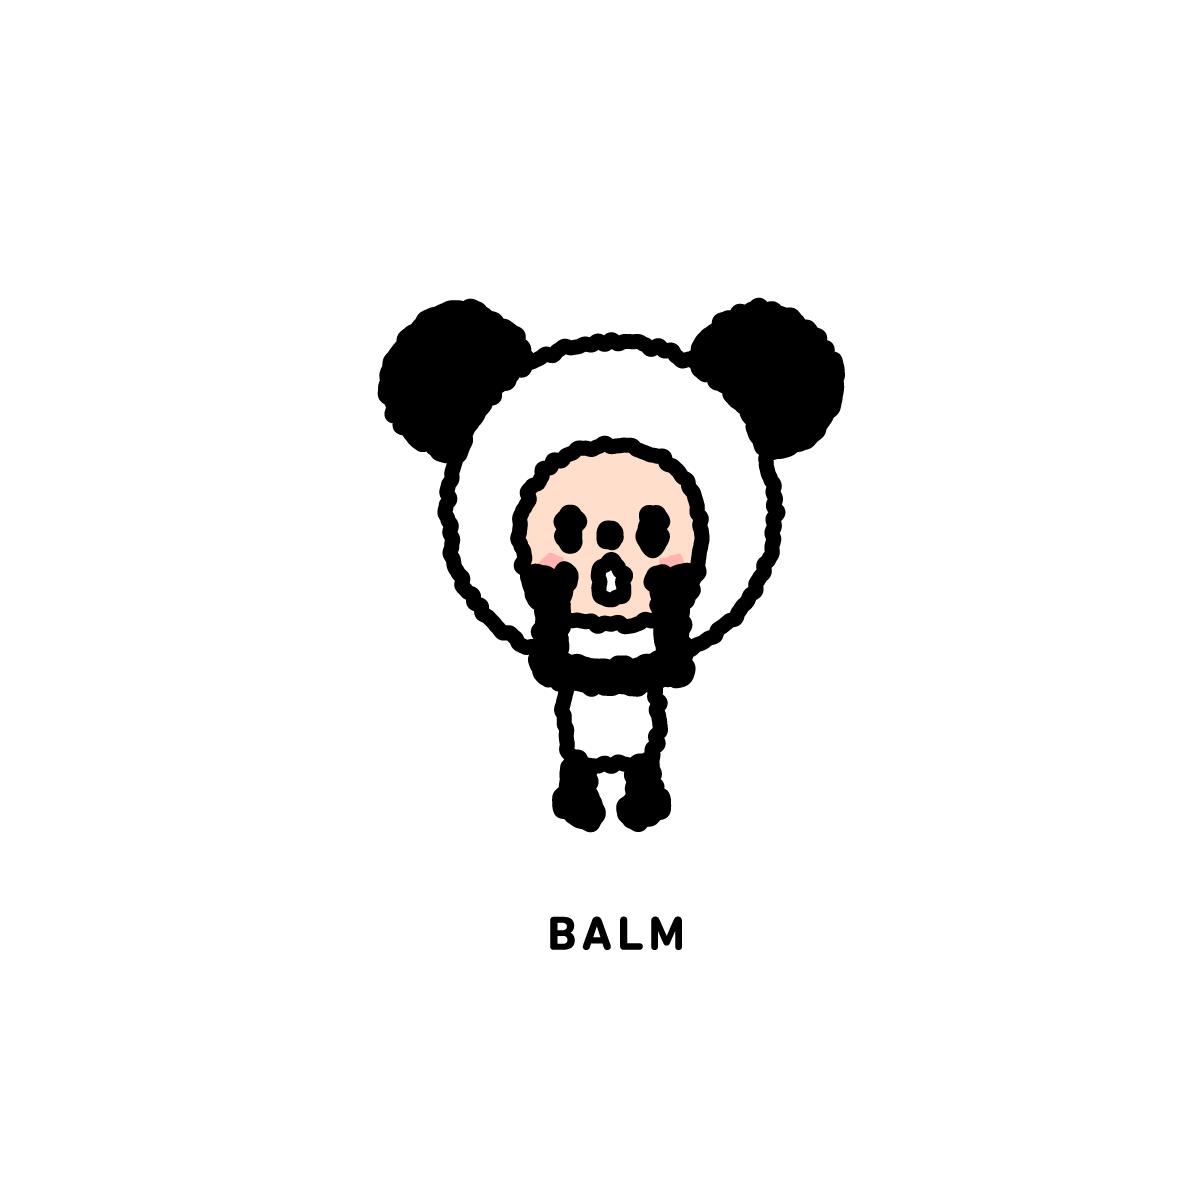 bebeboo-char-sample-balm.png